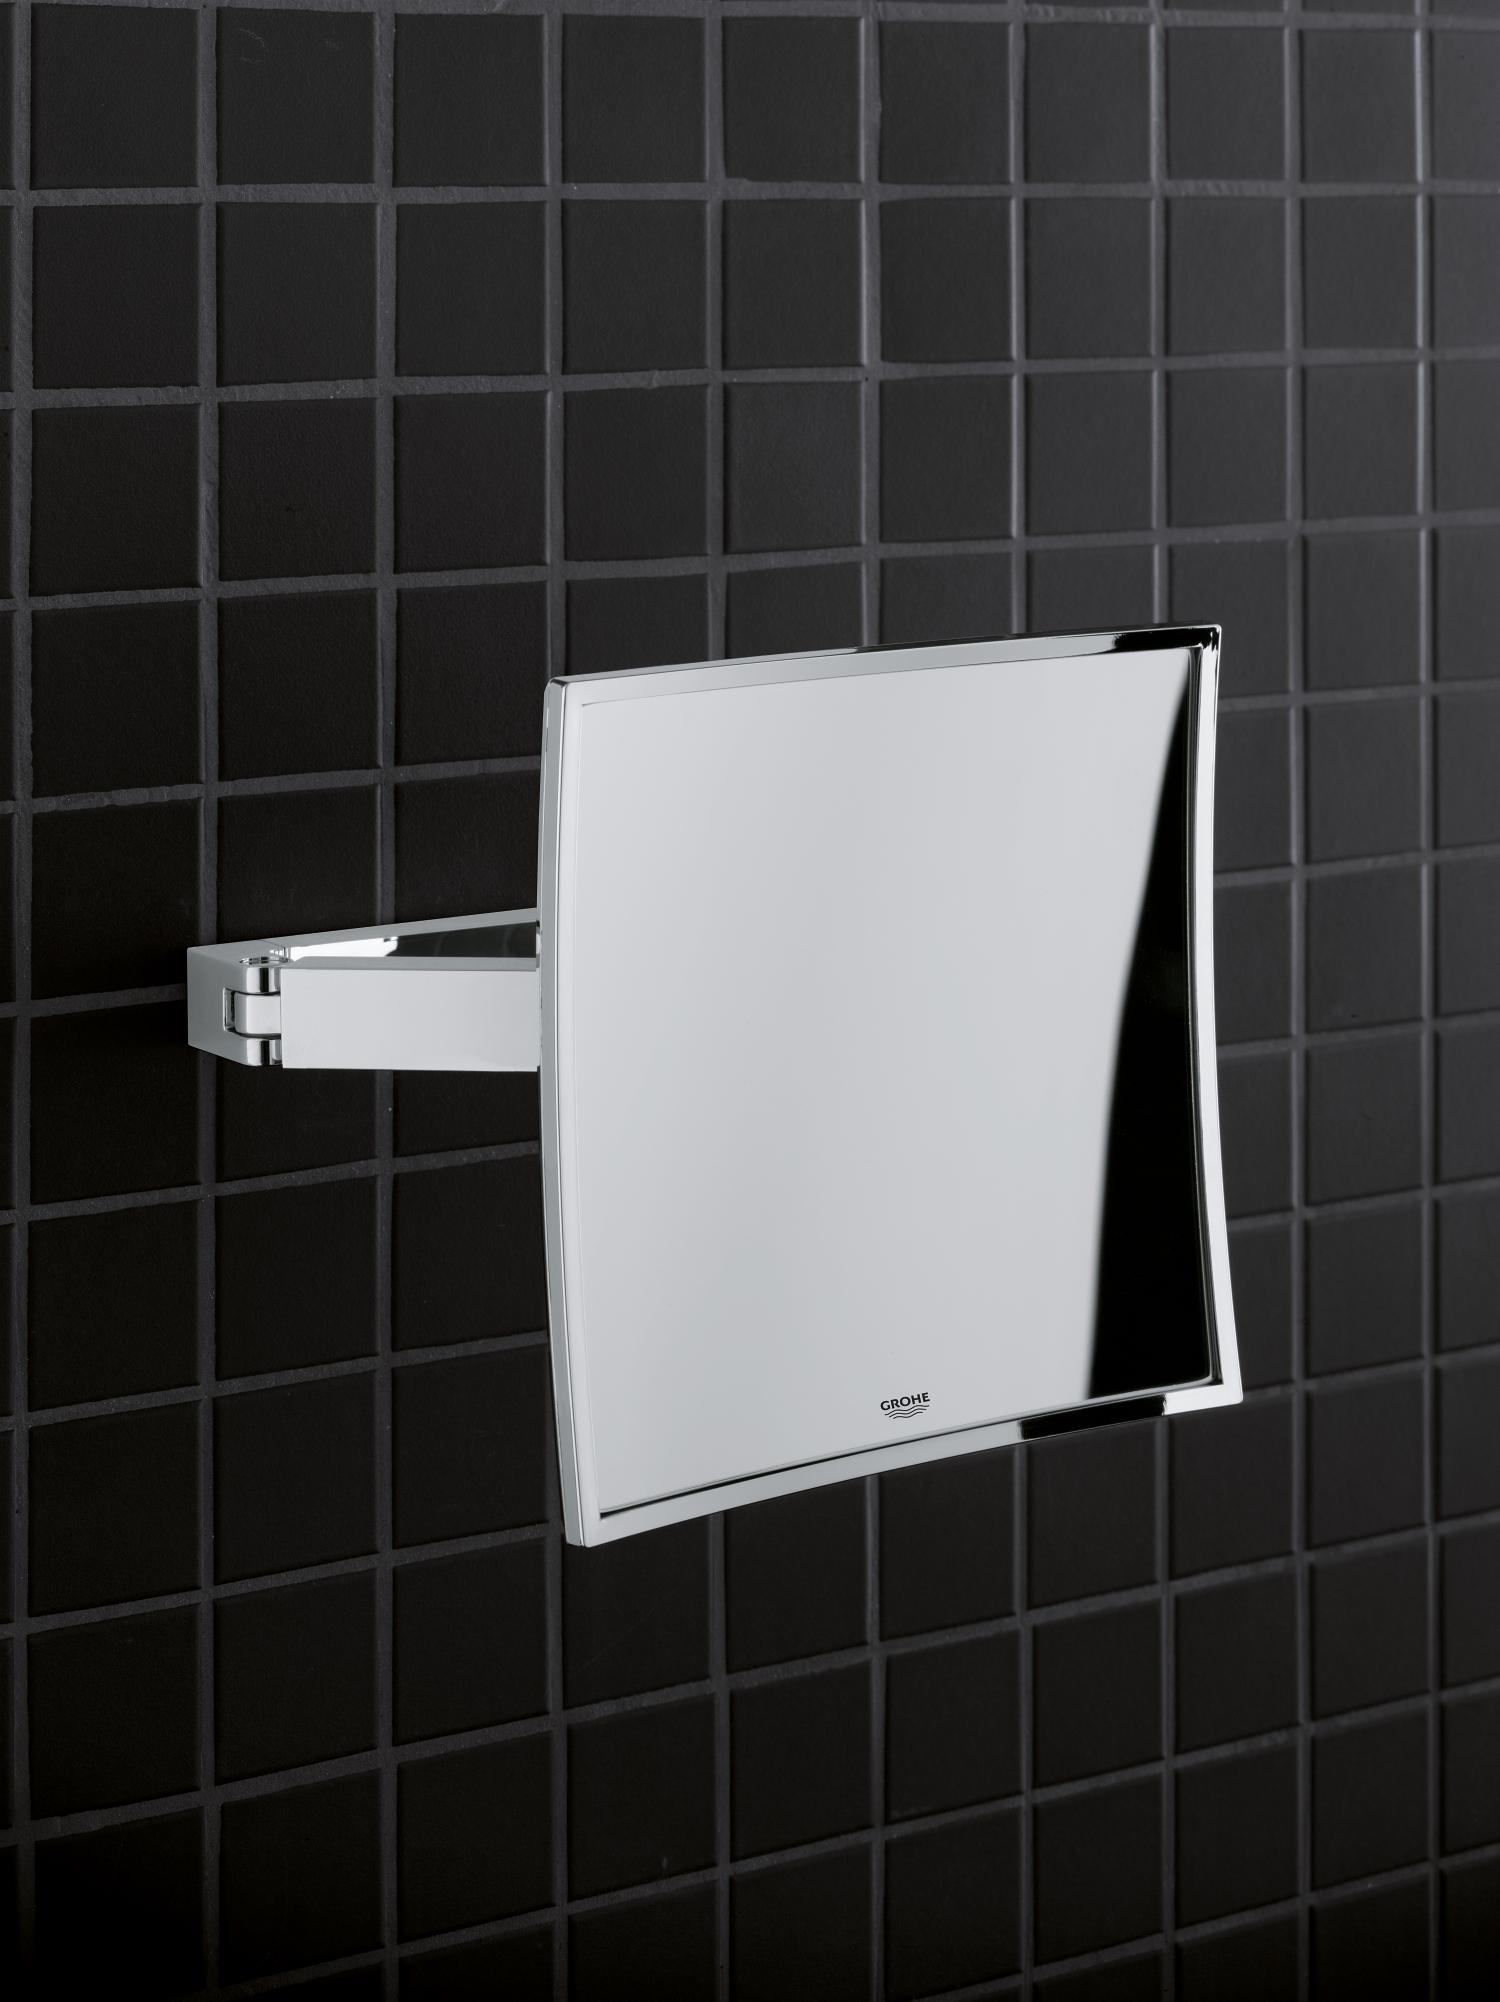 Grohe Selection Cube Kosmetikspiegel 3 fache Vergrößerung chrom